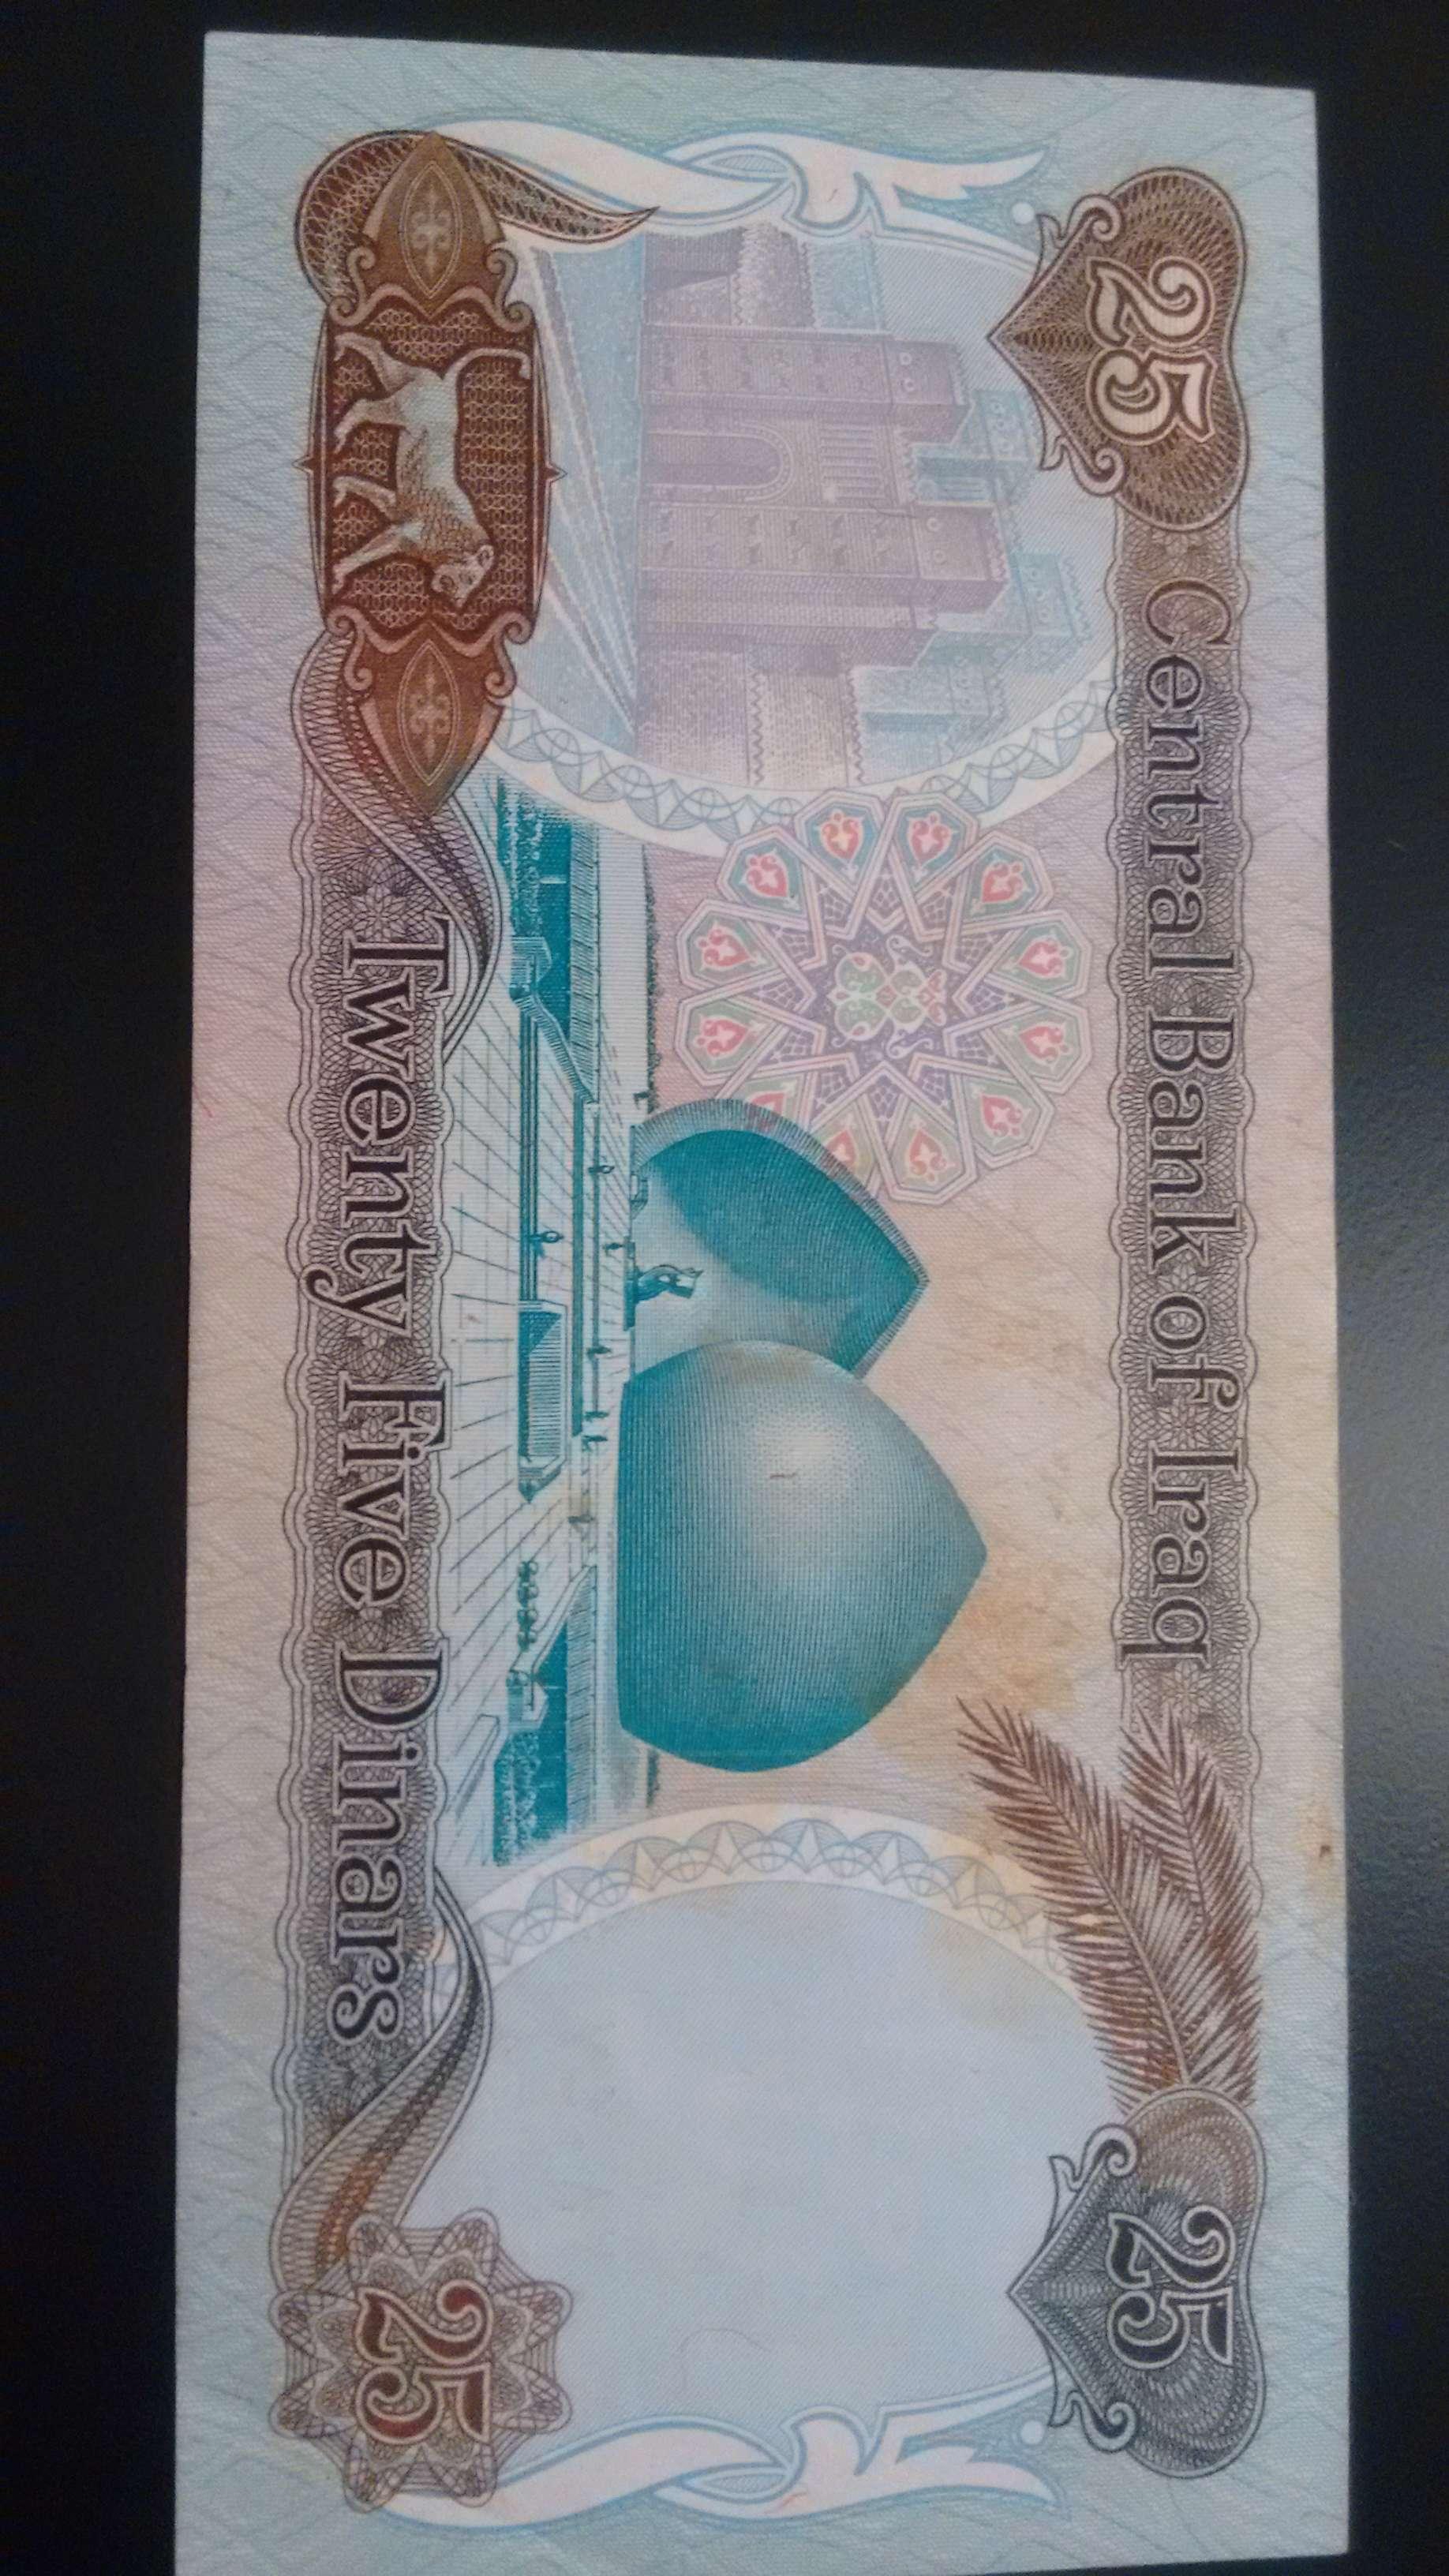 25 Dinares Iraq 1987 Img_2034